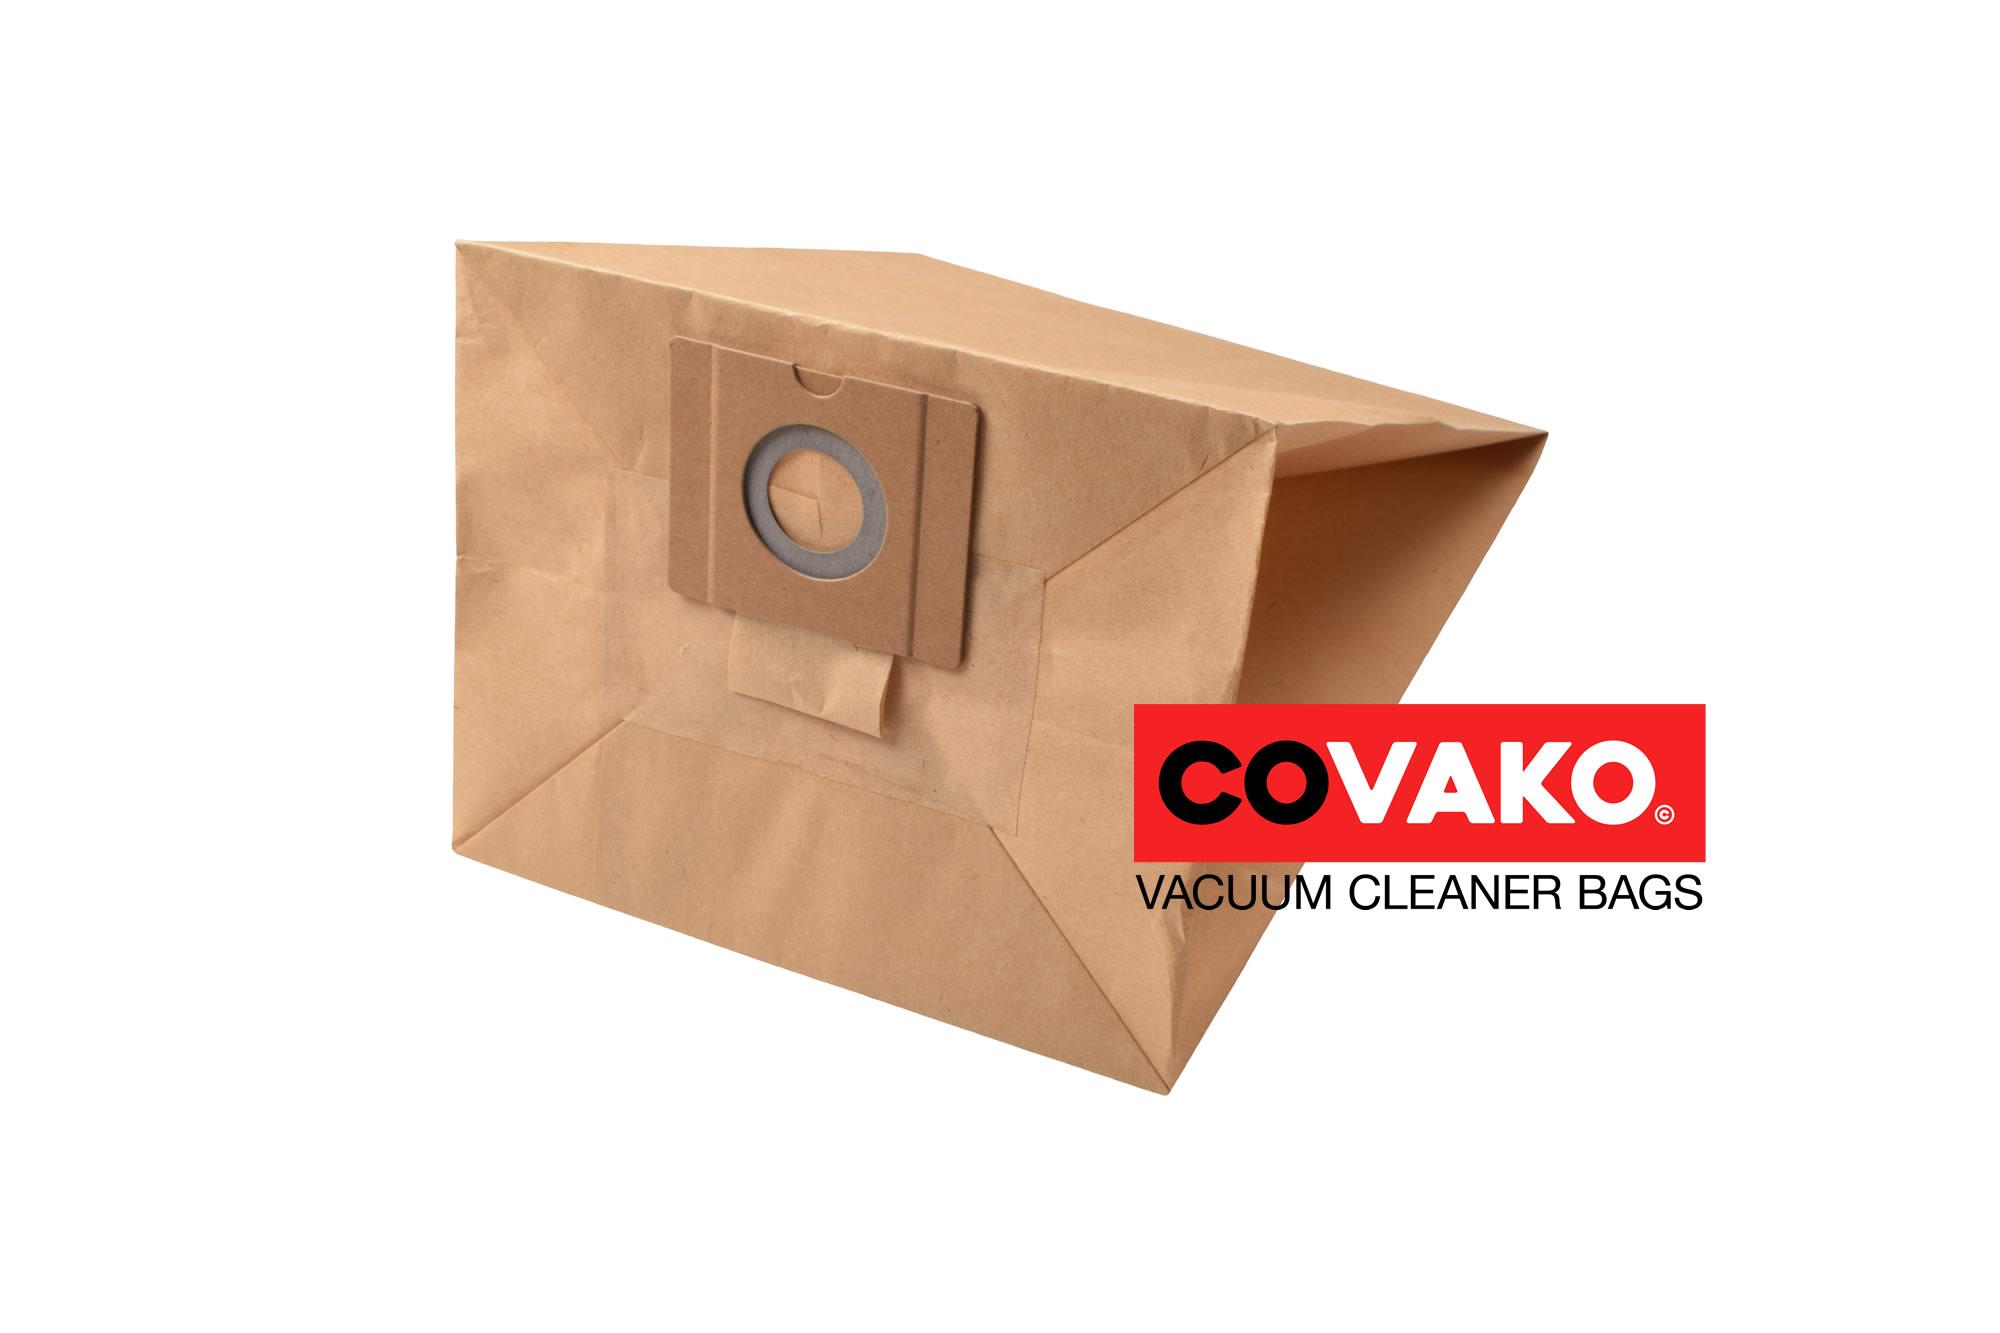 Comac Q-be good / Paper - Comac vacuum cleaner bags